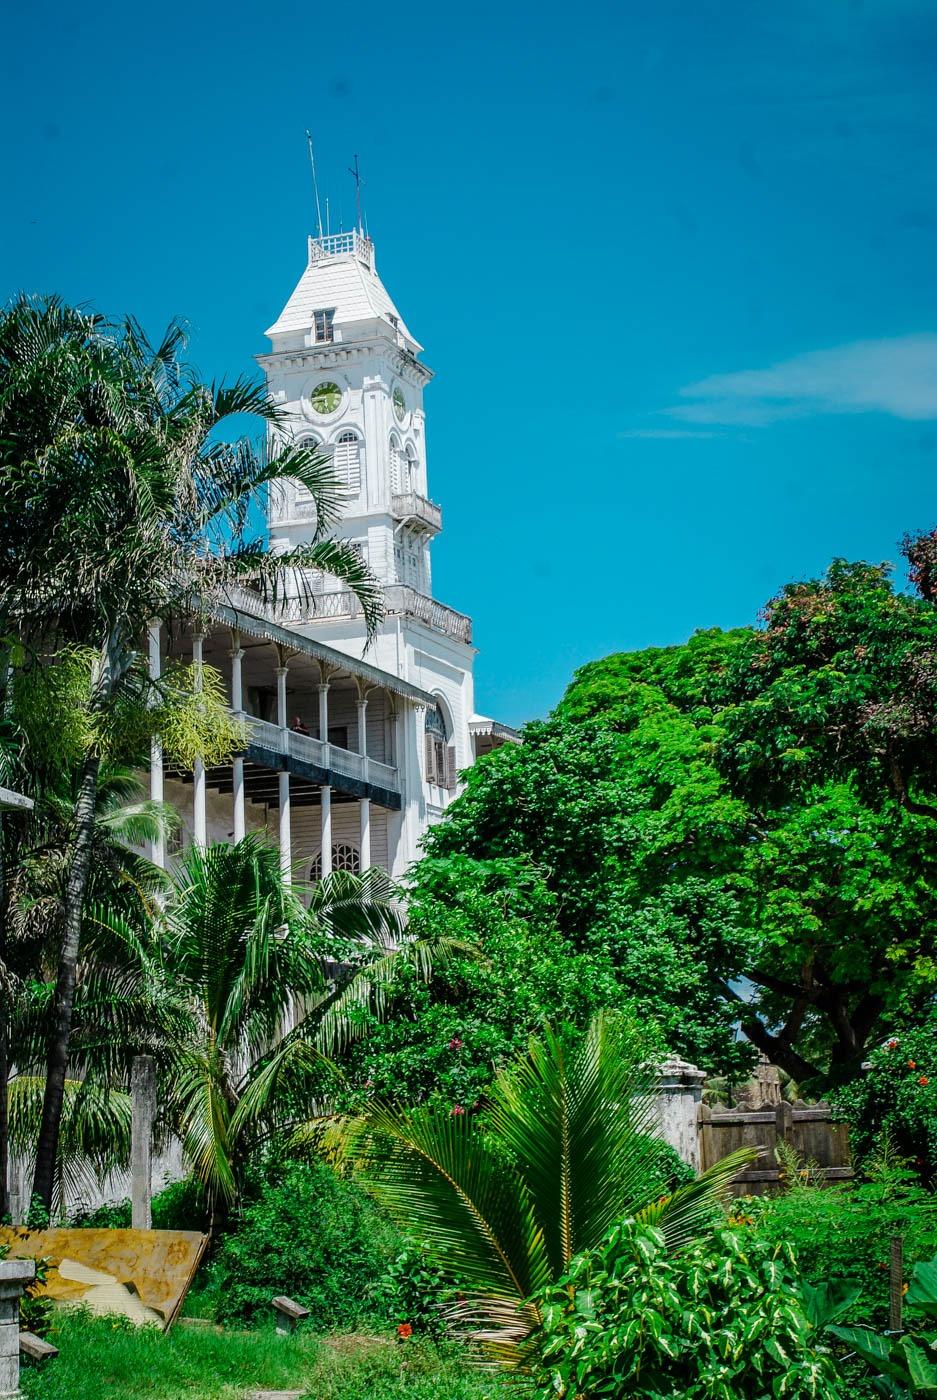 Stone Town, Zanzibar - Tanzania and Zanzibar - an exotic adventure.